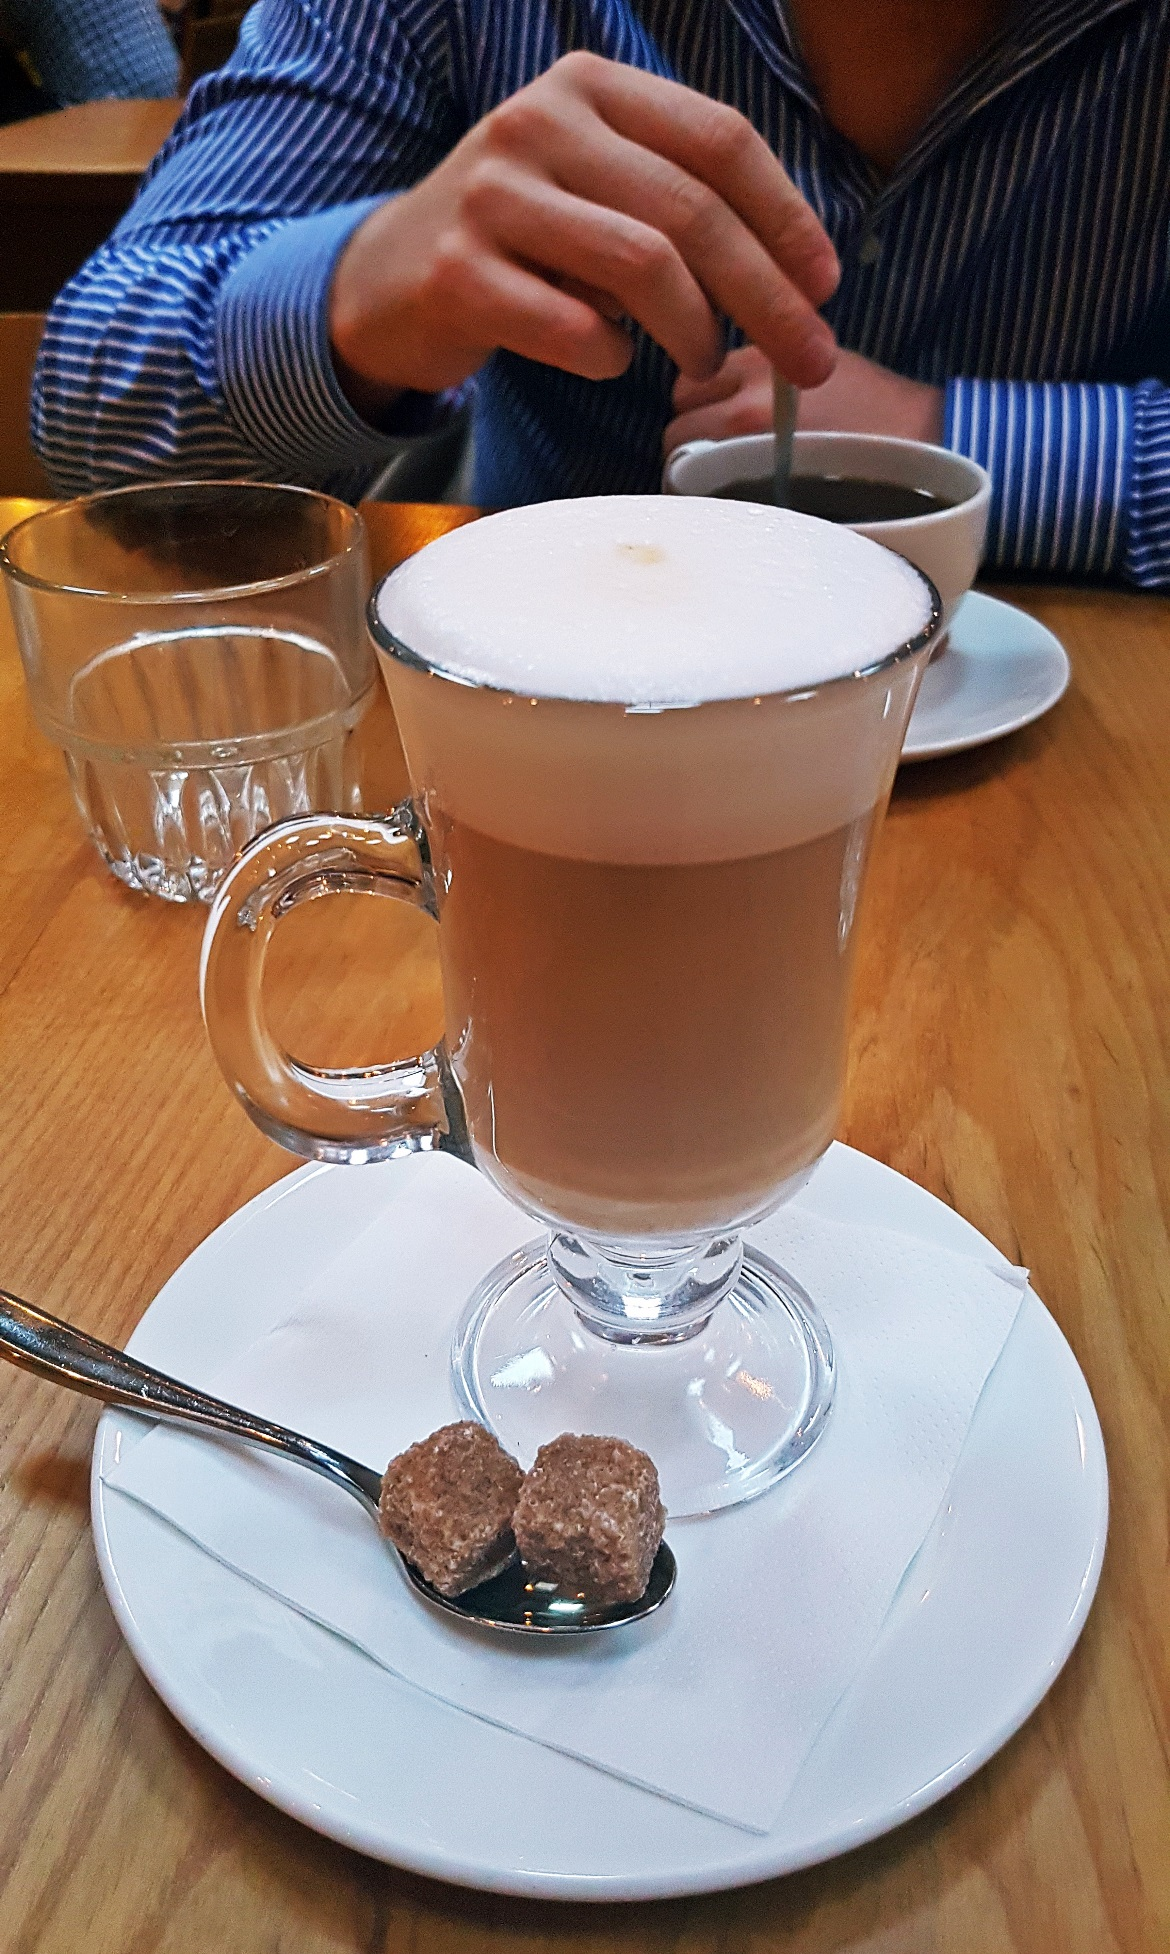 Decaf latte - Restaurant Review of Shears Yard, Leeds Restaurant Week menu by BeckyBecky Blogs